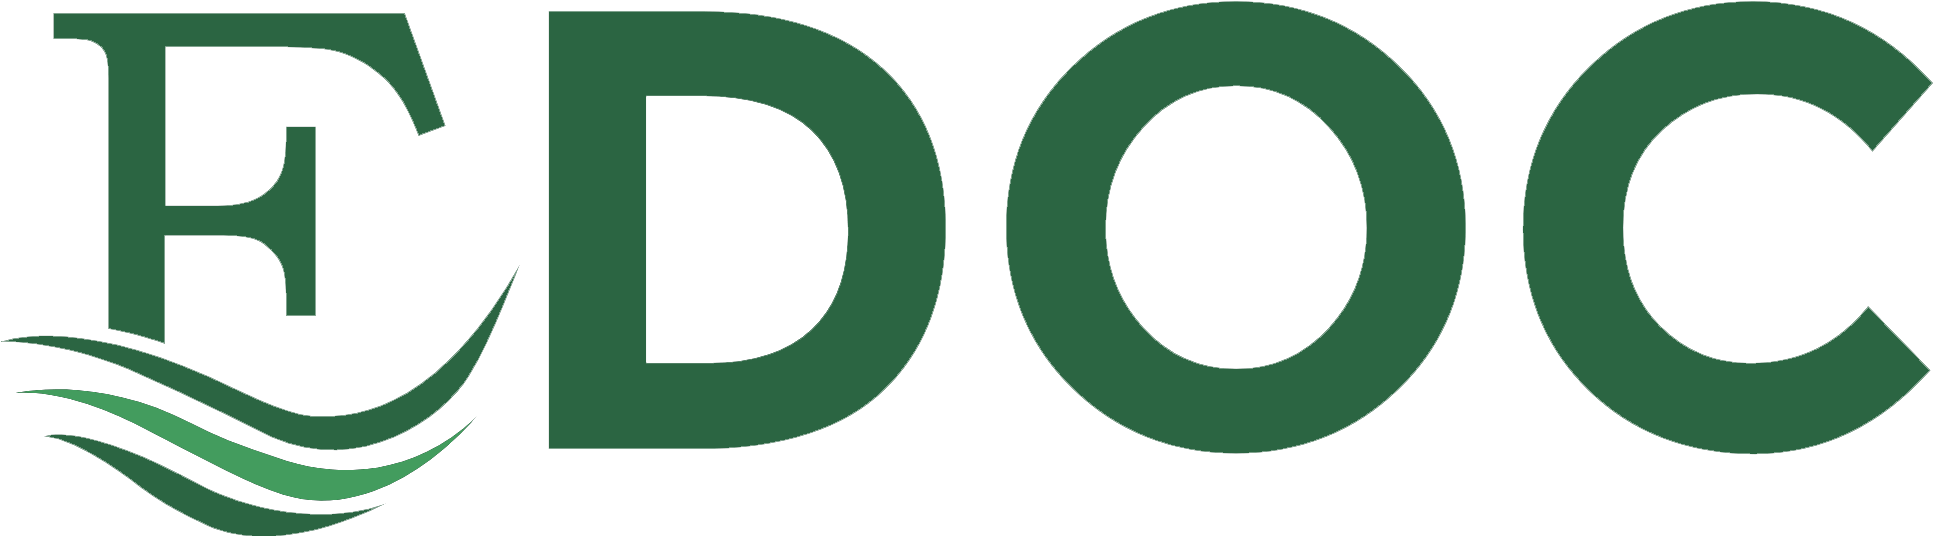 Borland Delphi Logo - LogoDix